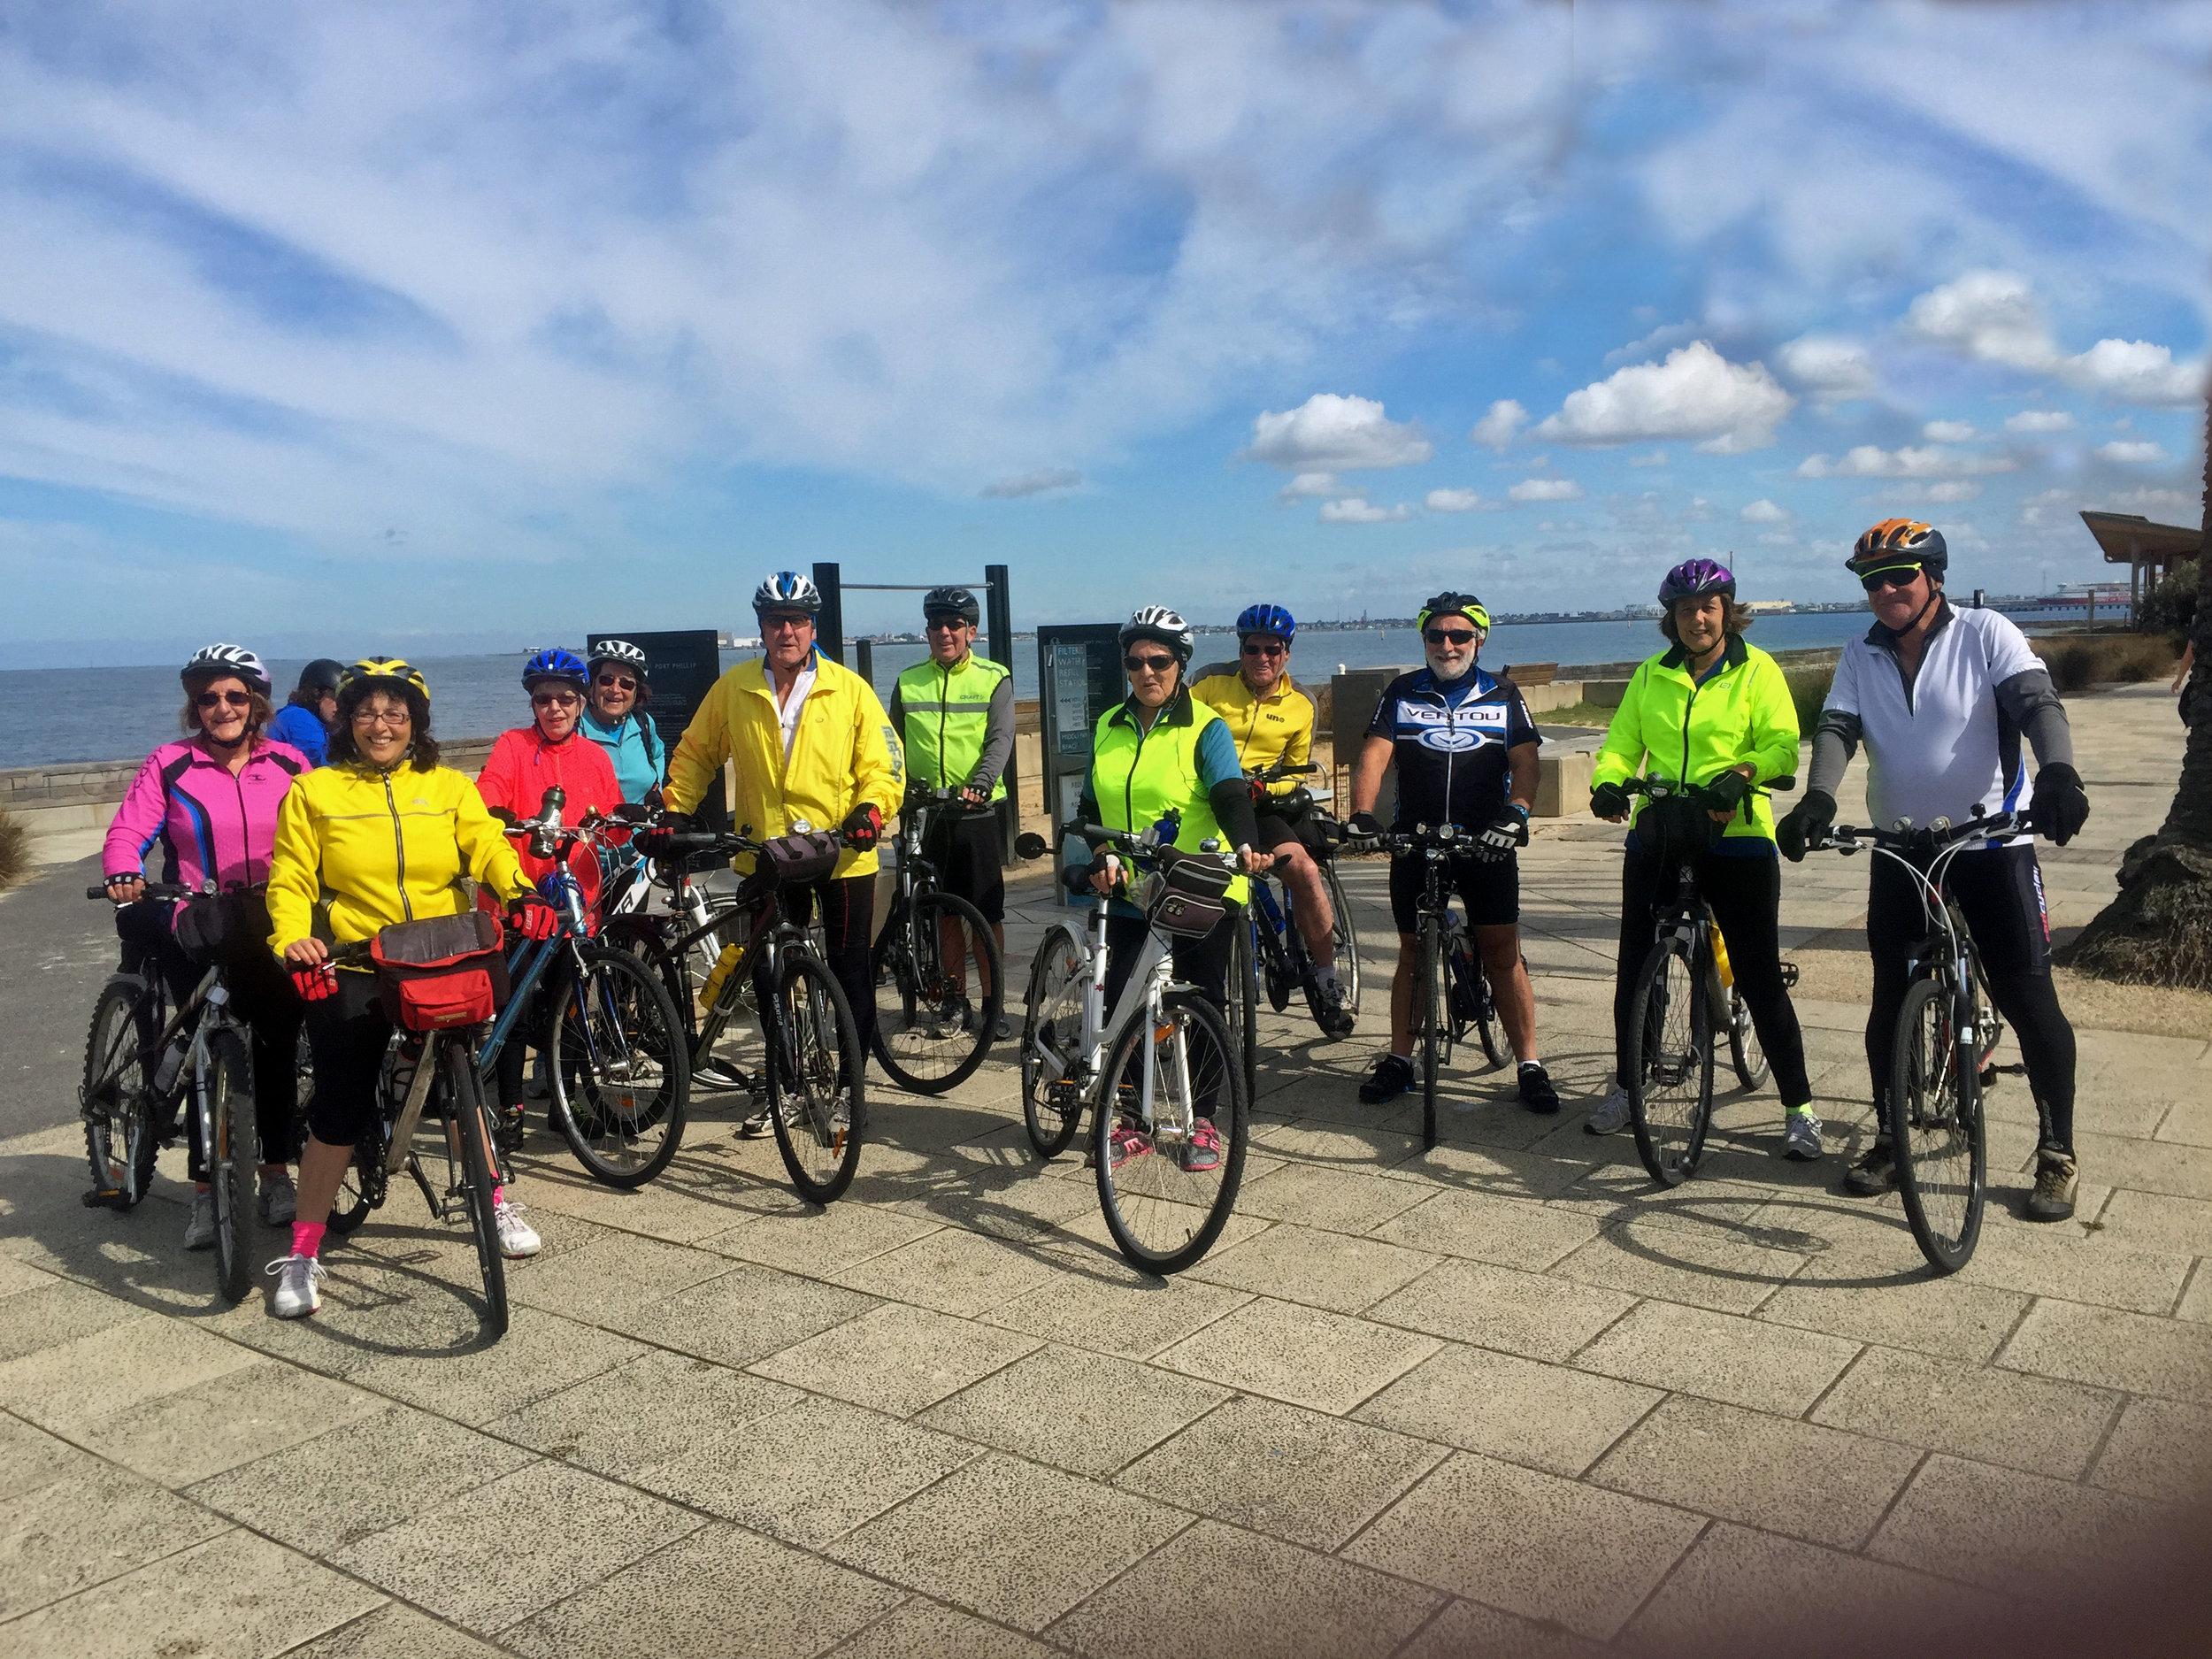 Photo credit: Allan Fowler - U3A Whittlesea 'Thursday Bike RIde'